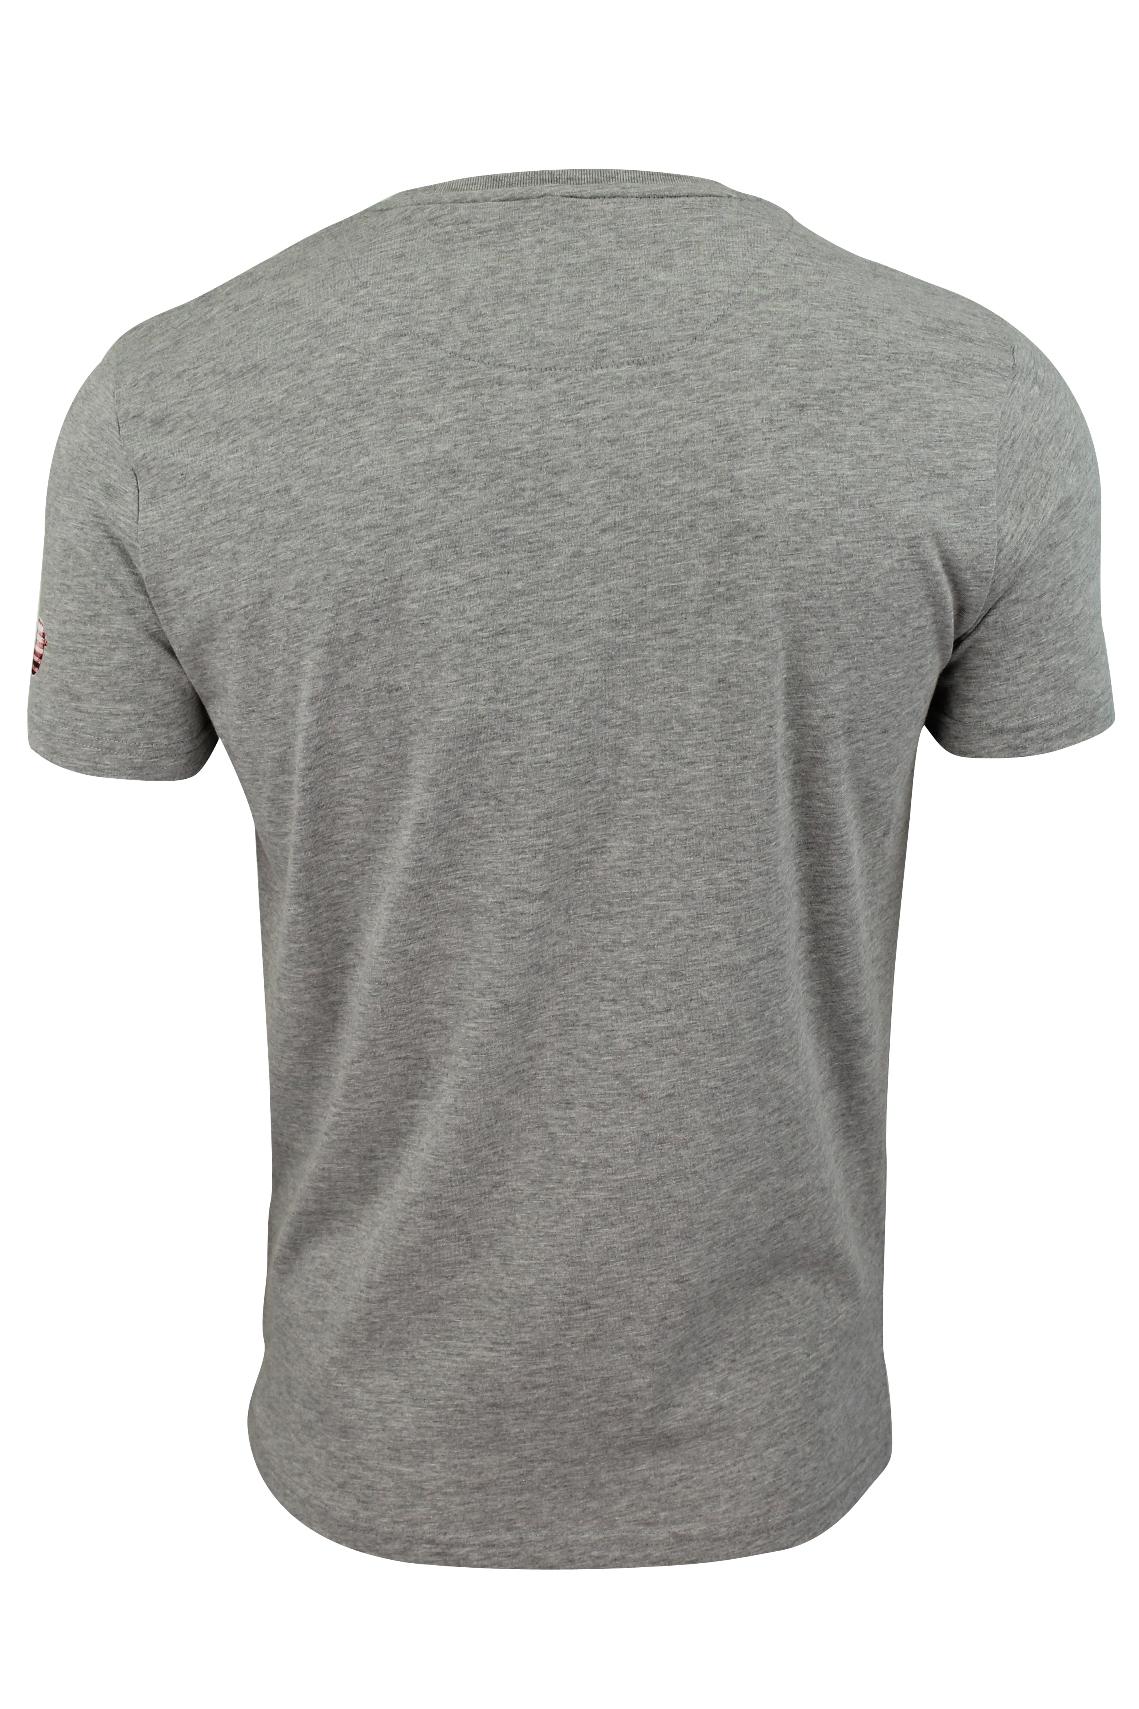 Mens T-Shirt by Brave Soul 'Marley' Short Sleeved